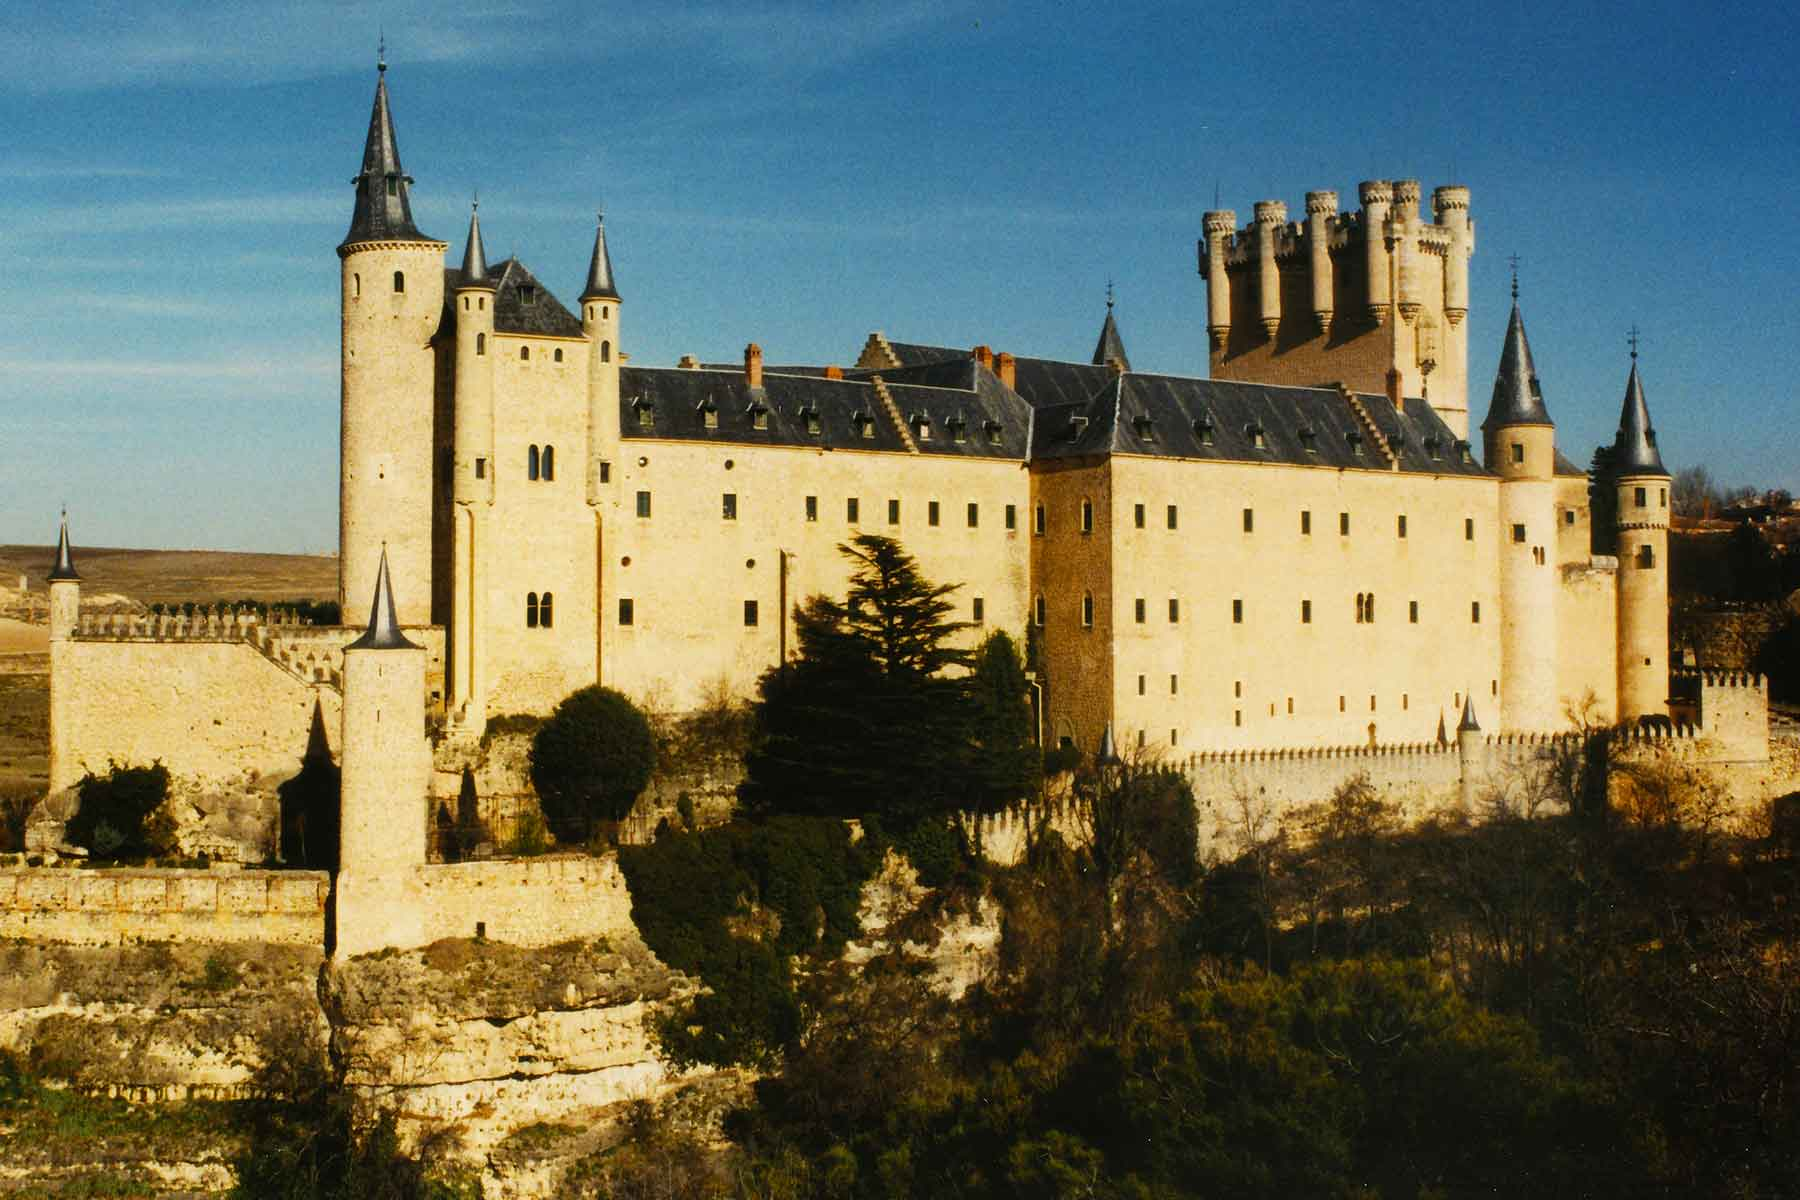 Alcazar - Segovia - Spain - Steven Andrew Martin - Study Abroad Journal 1998